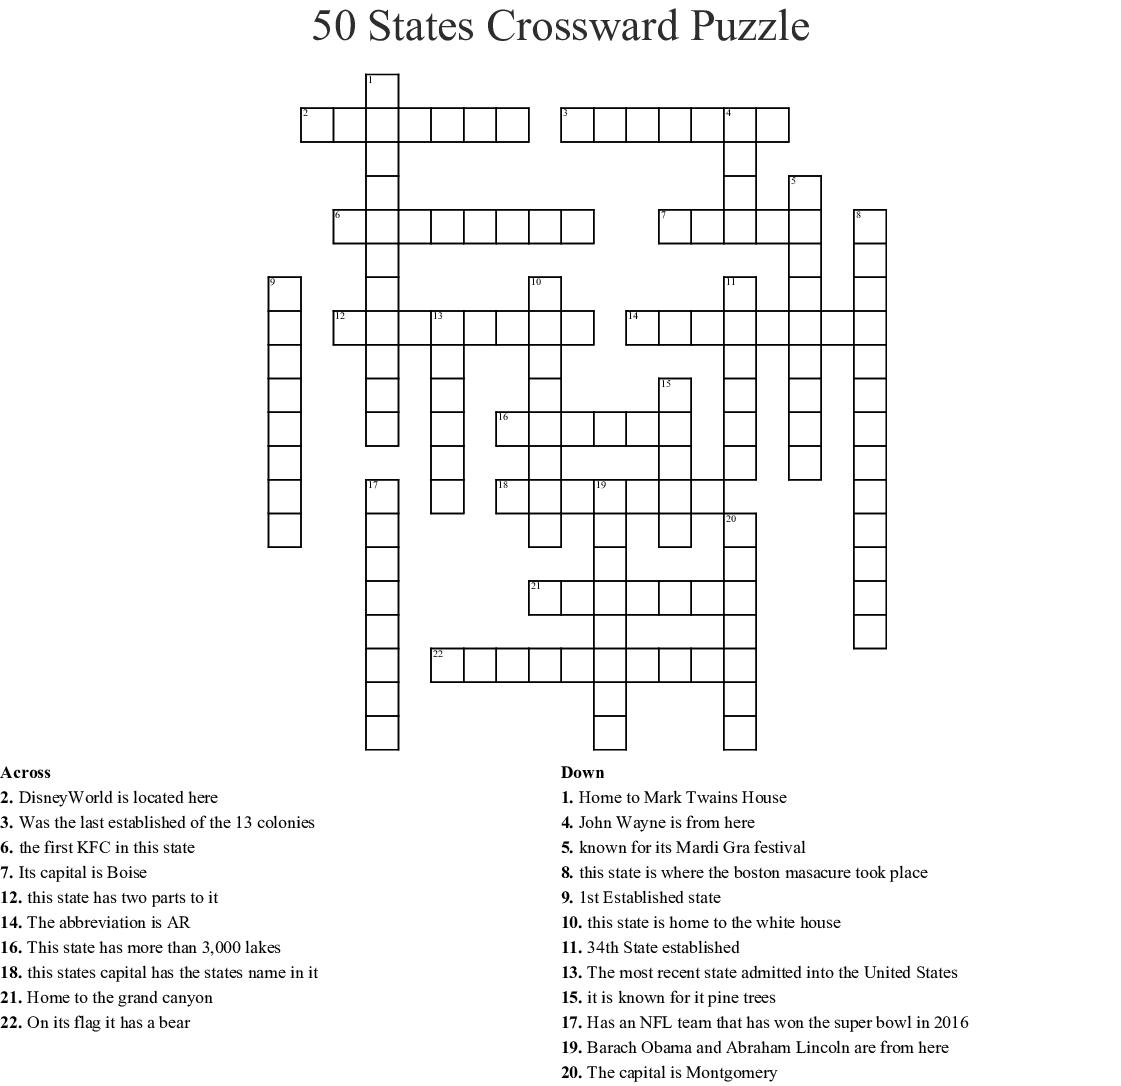 50 States Crossward Puzzle Crossword - Wordmint - Printable United States Crossword Puzzle